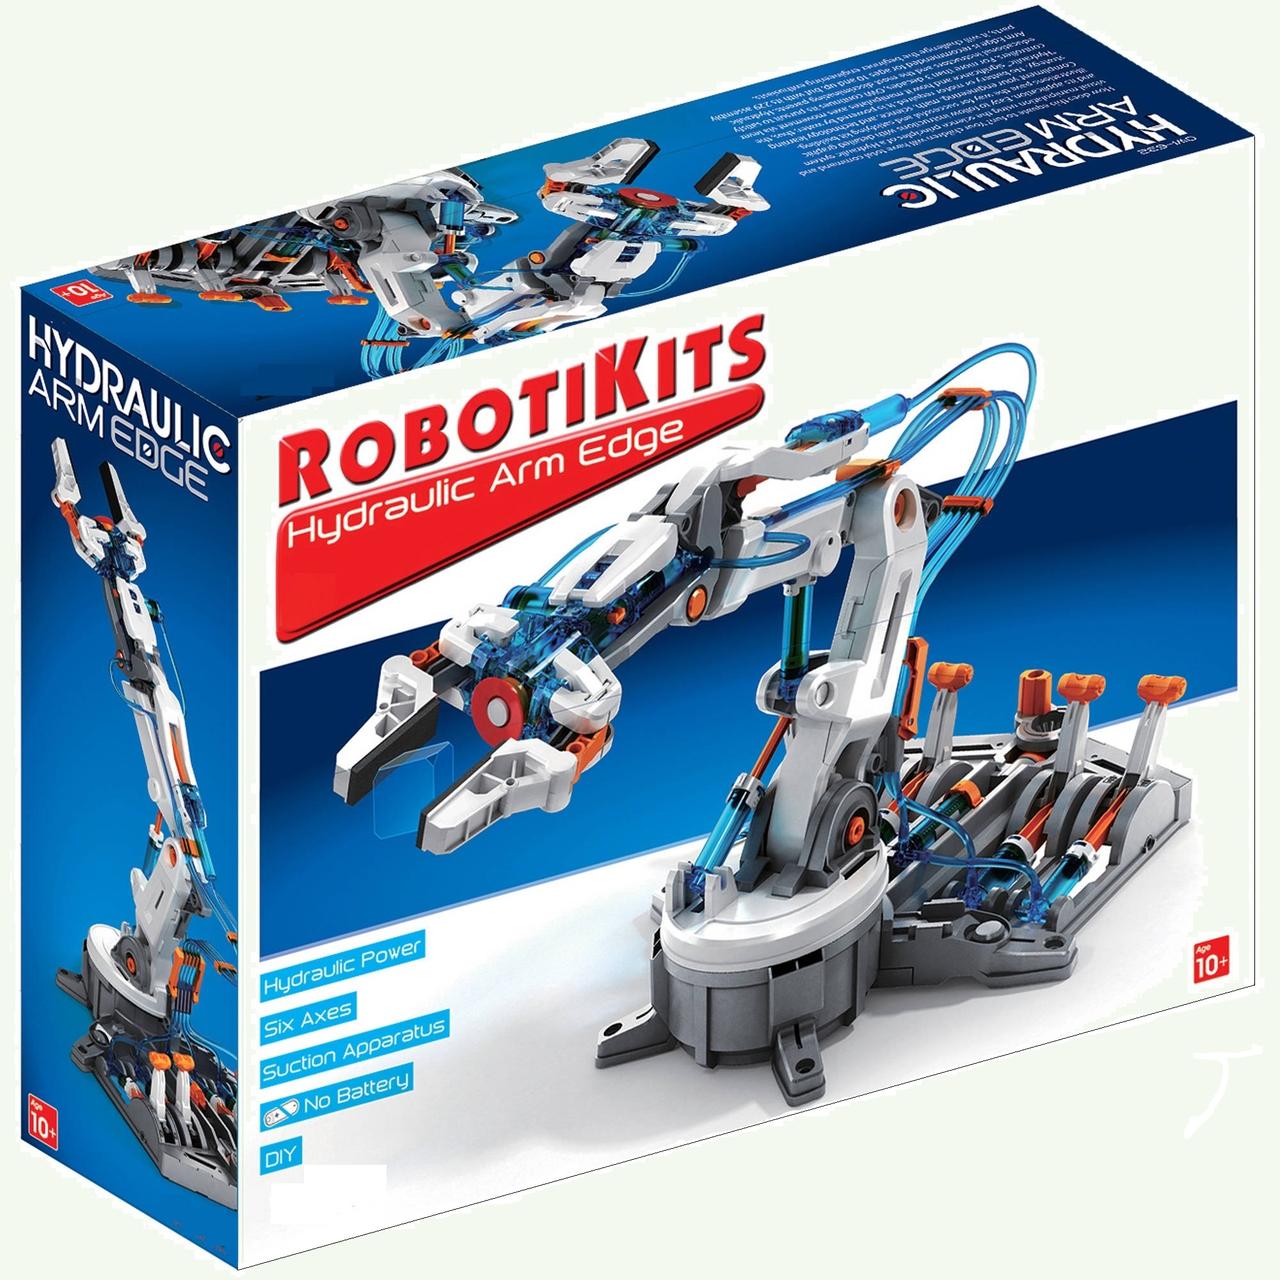 Конструктор гидравлический манипулятор Roboti Kits (AB003)